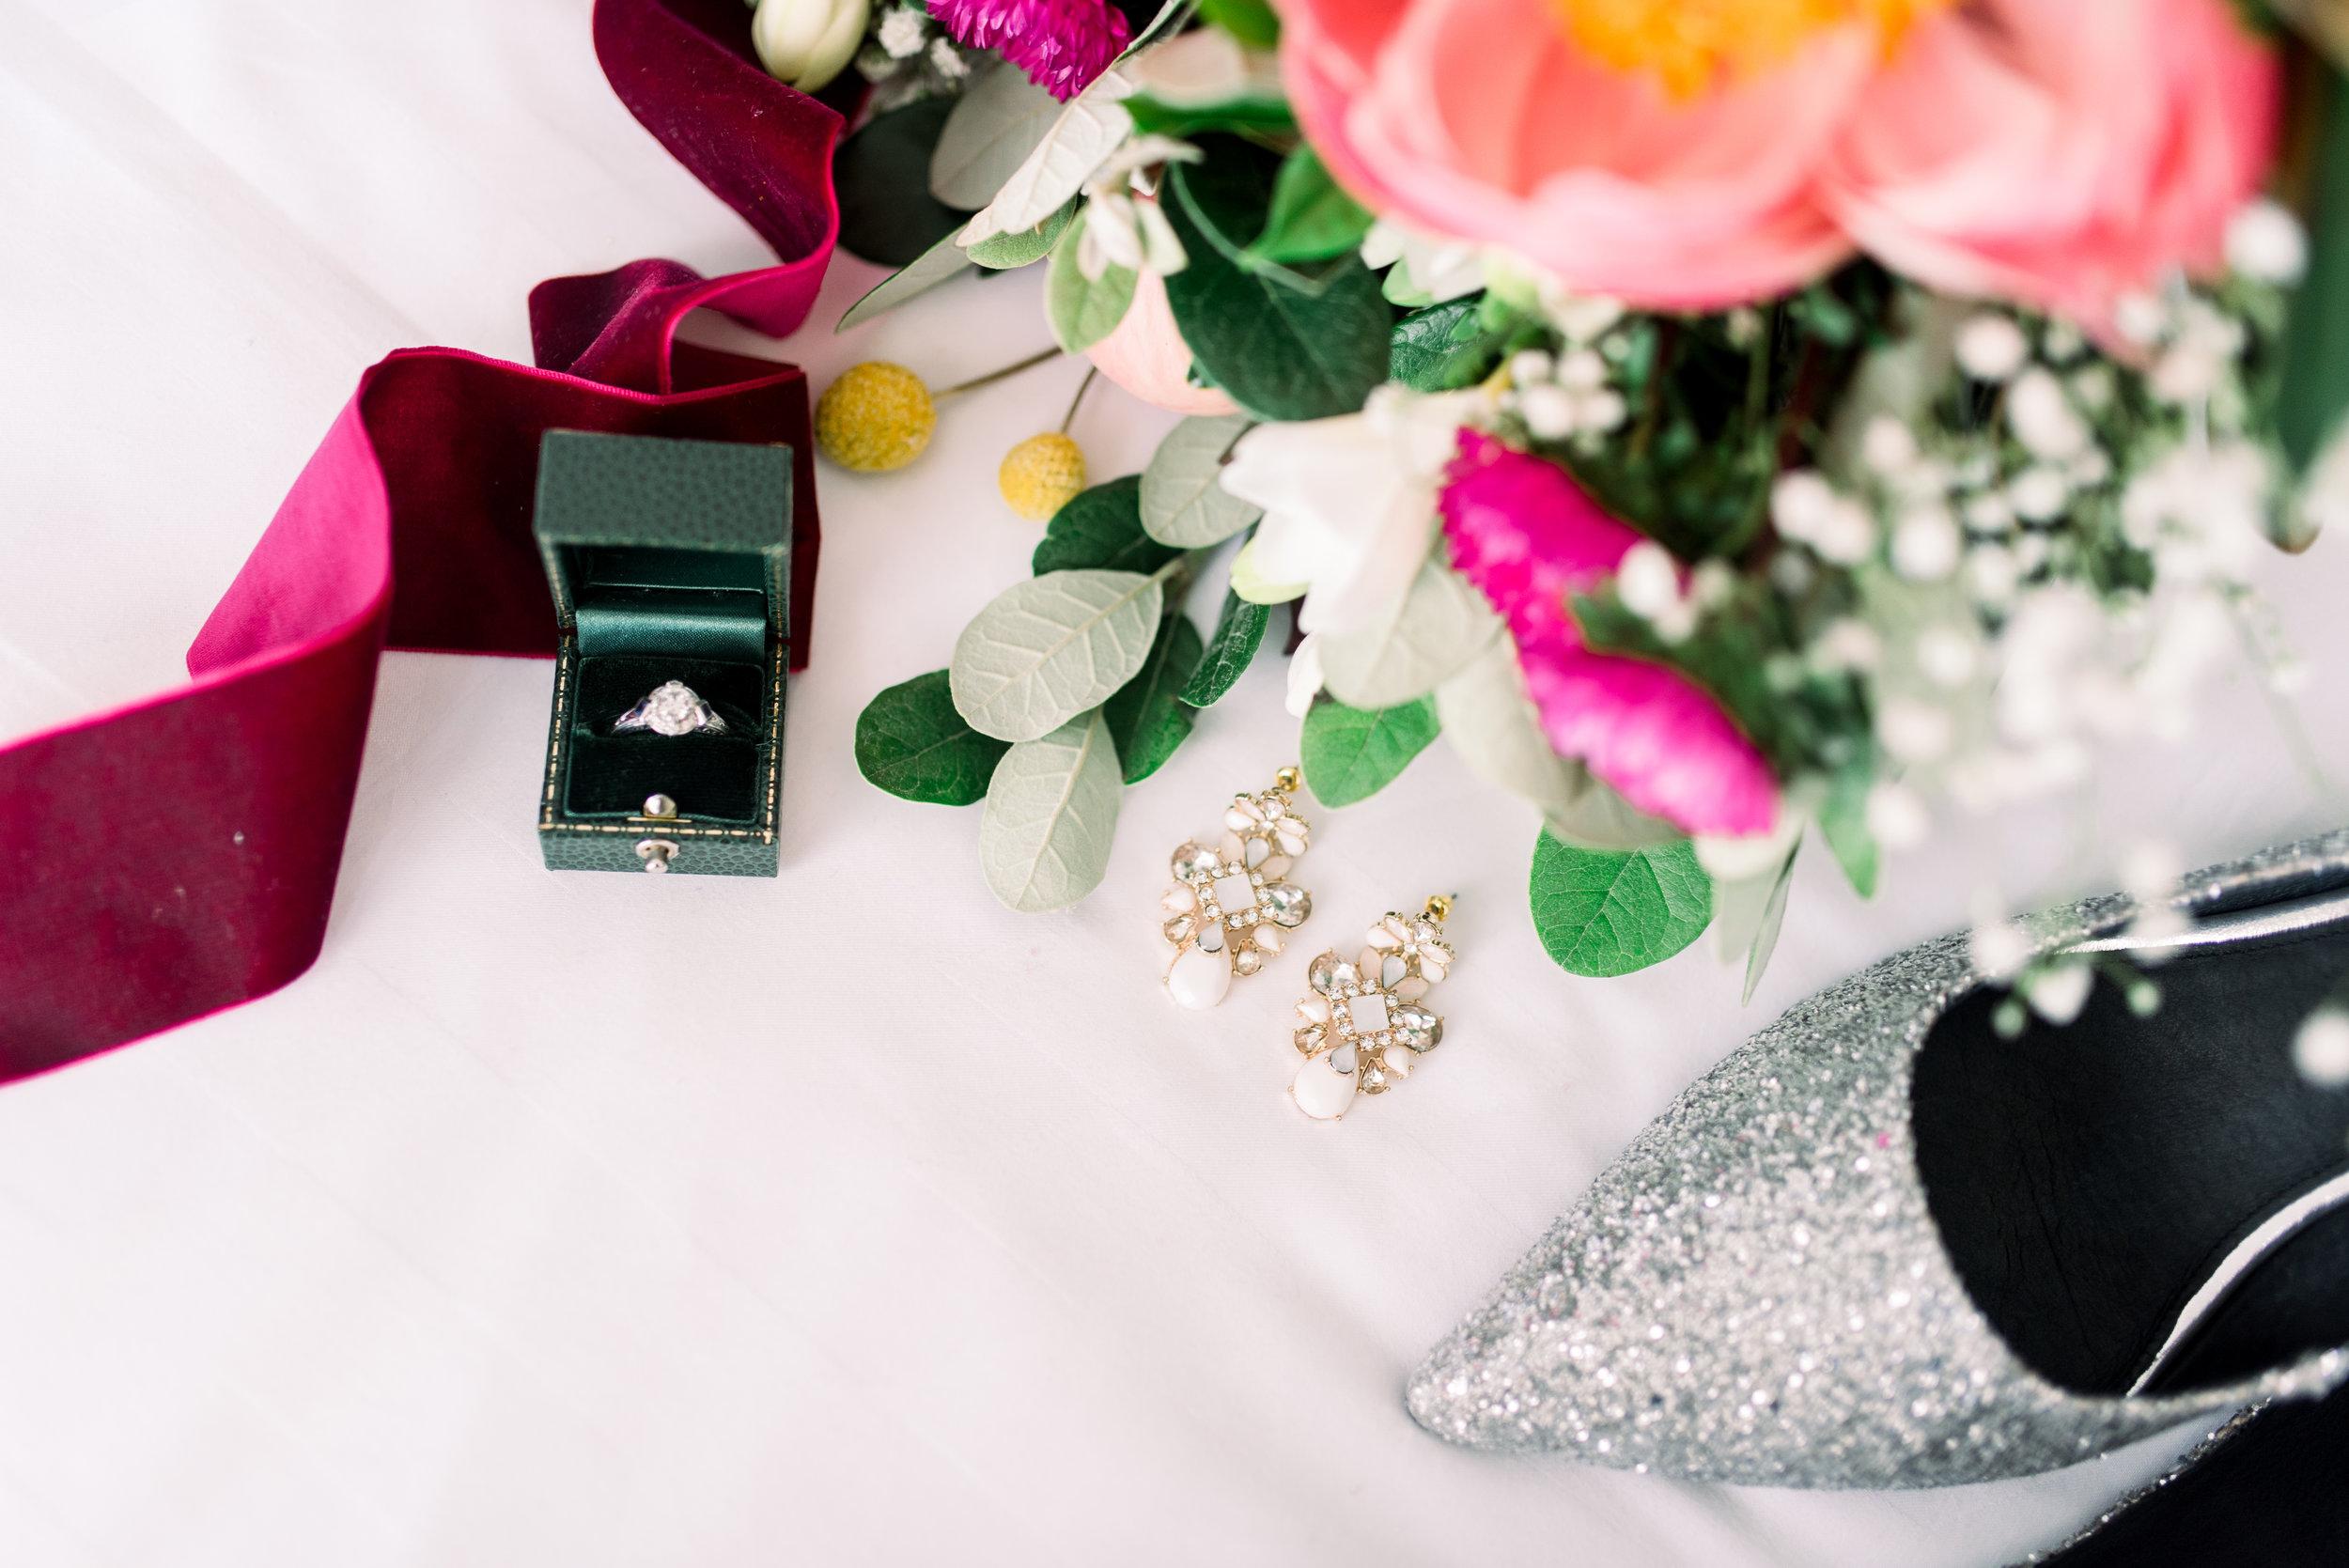 brisbane-city-wedding-photography-details-1.jpg